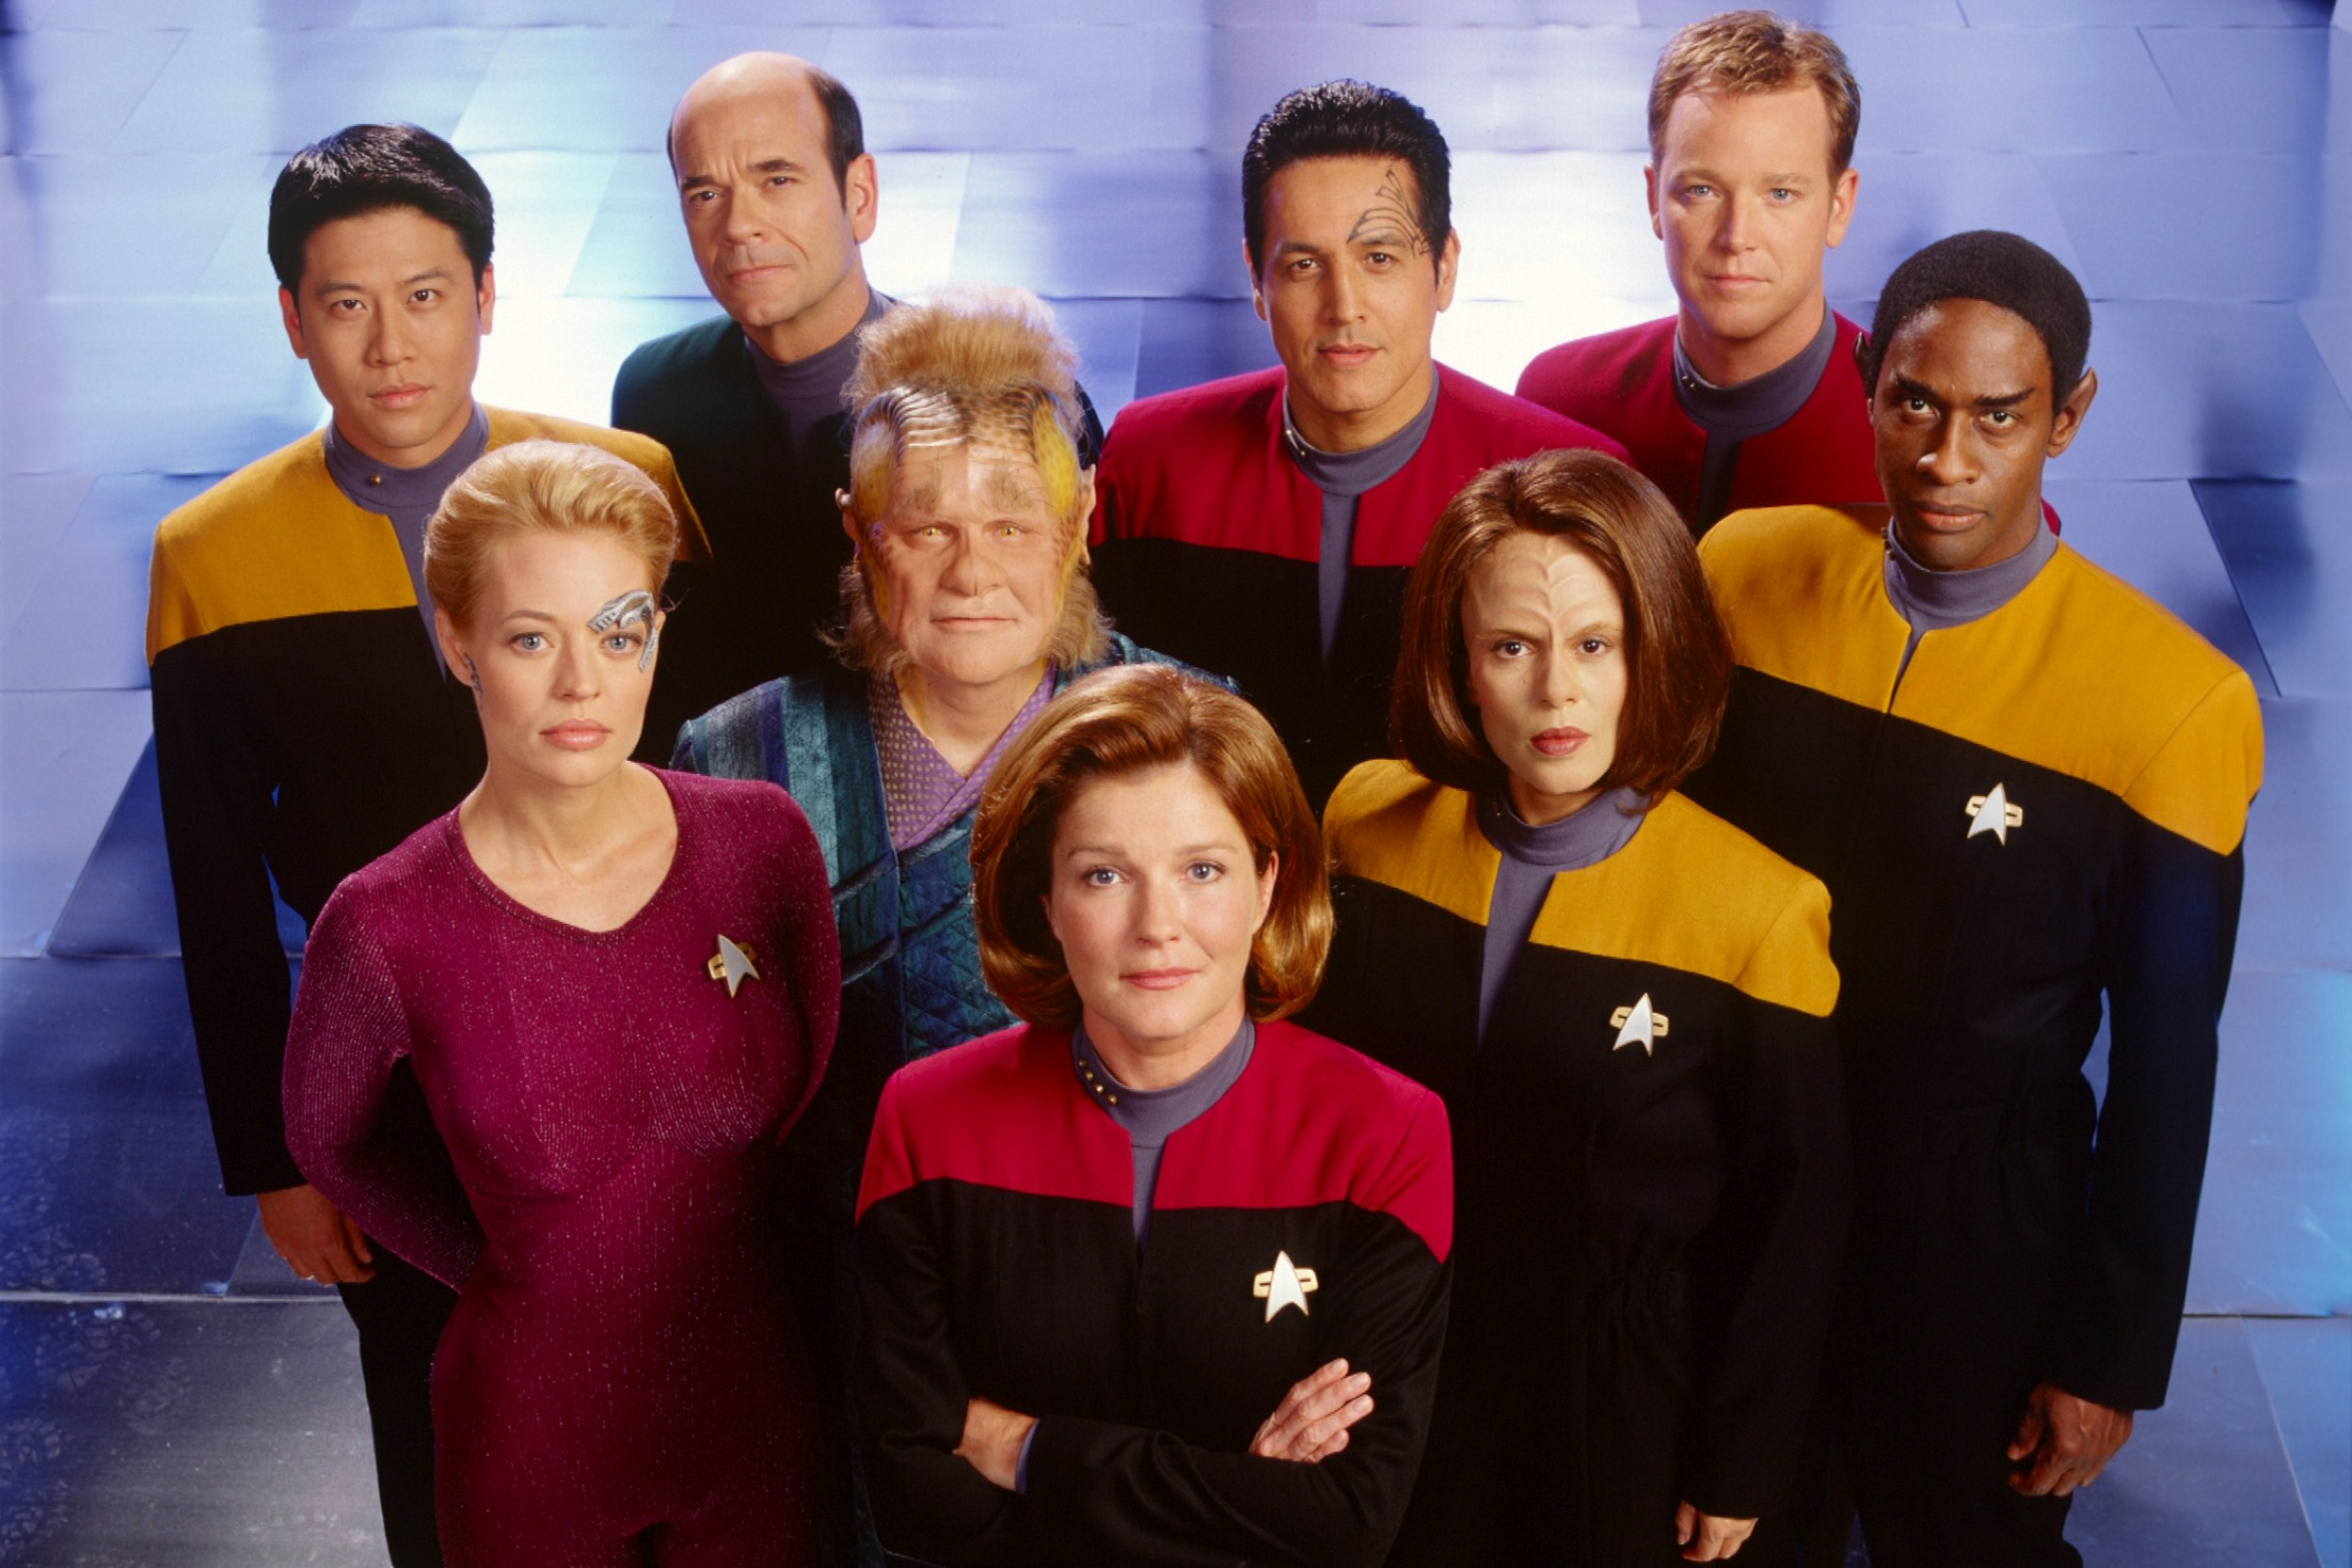 The cast of Star Trek: Voyager.